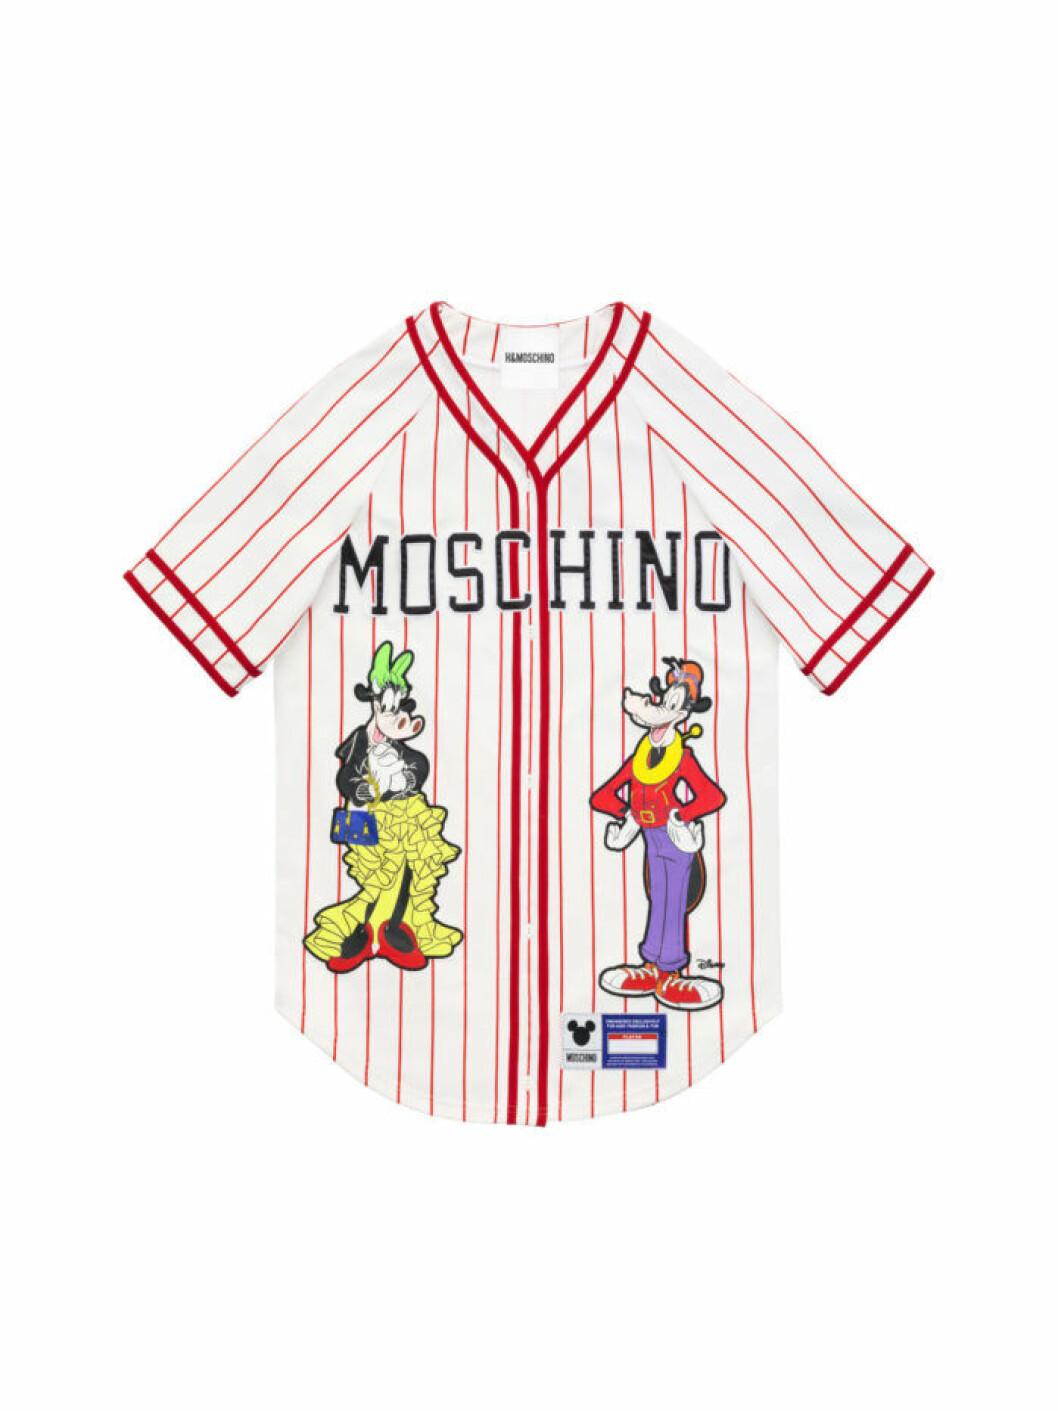 Baseballtröja med Disneyfigurer Moschino [tv] H&M